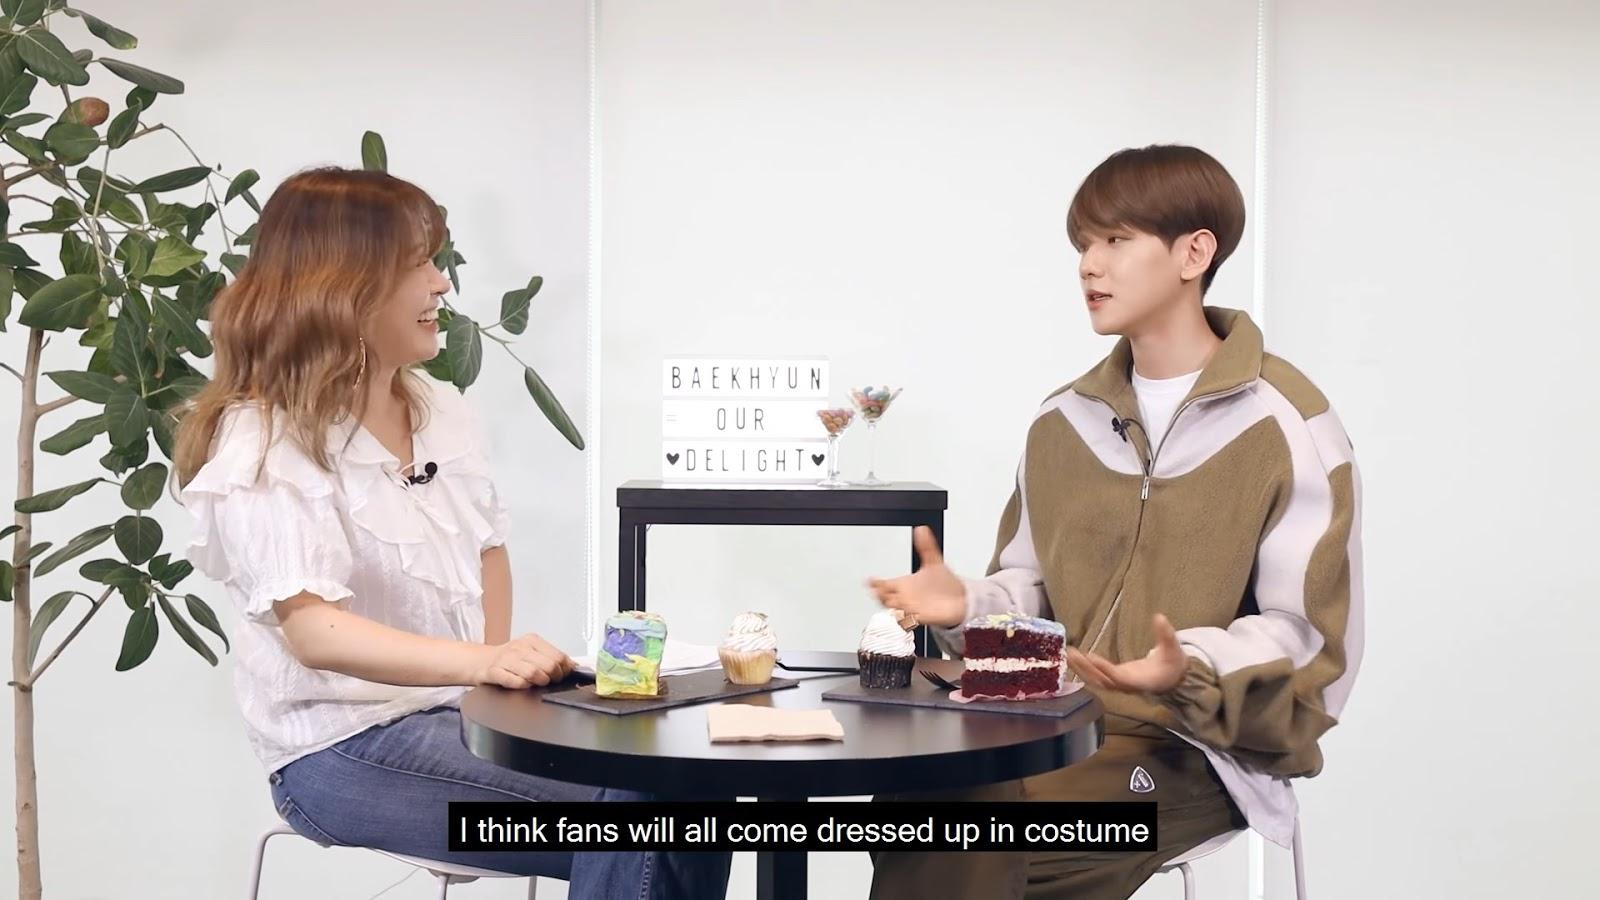 exo baekhyun iheartradio 4